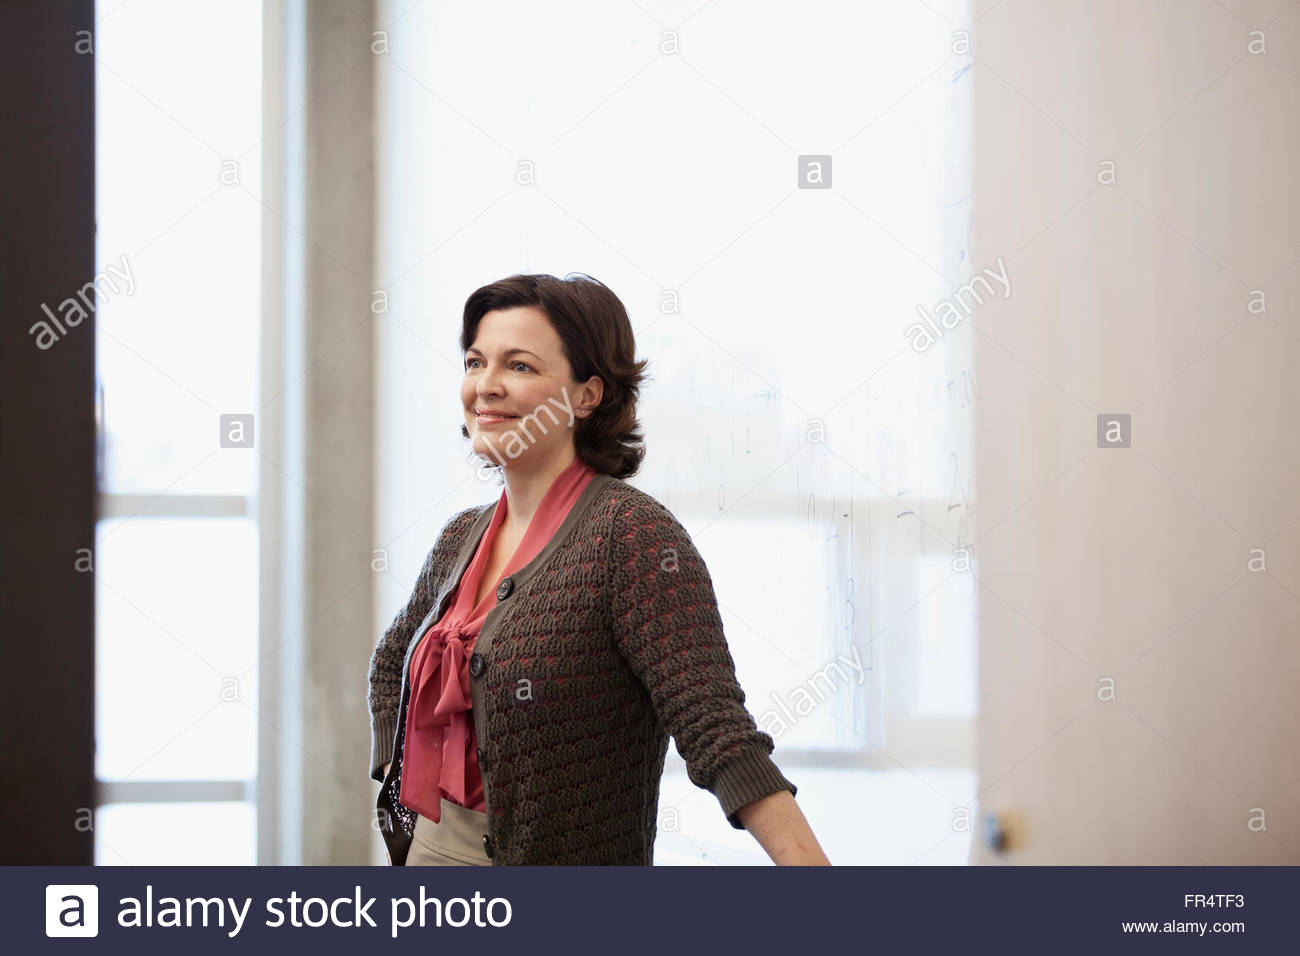 college instructor teaching mathematics - Stock Image